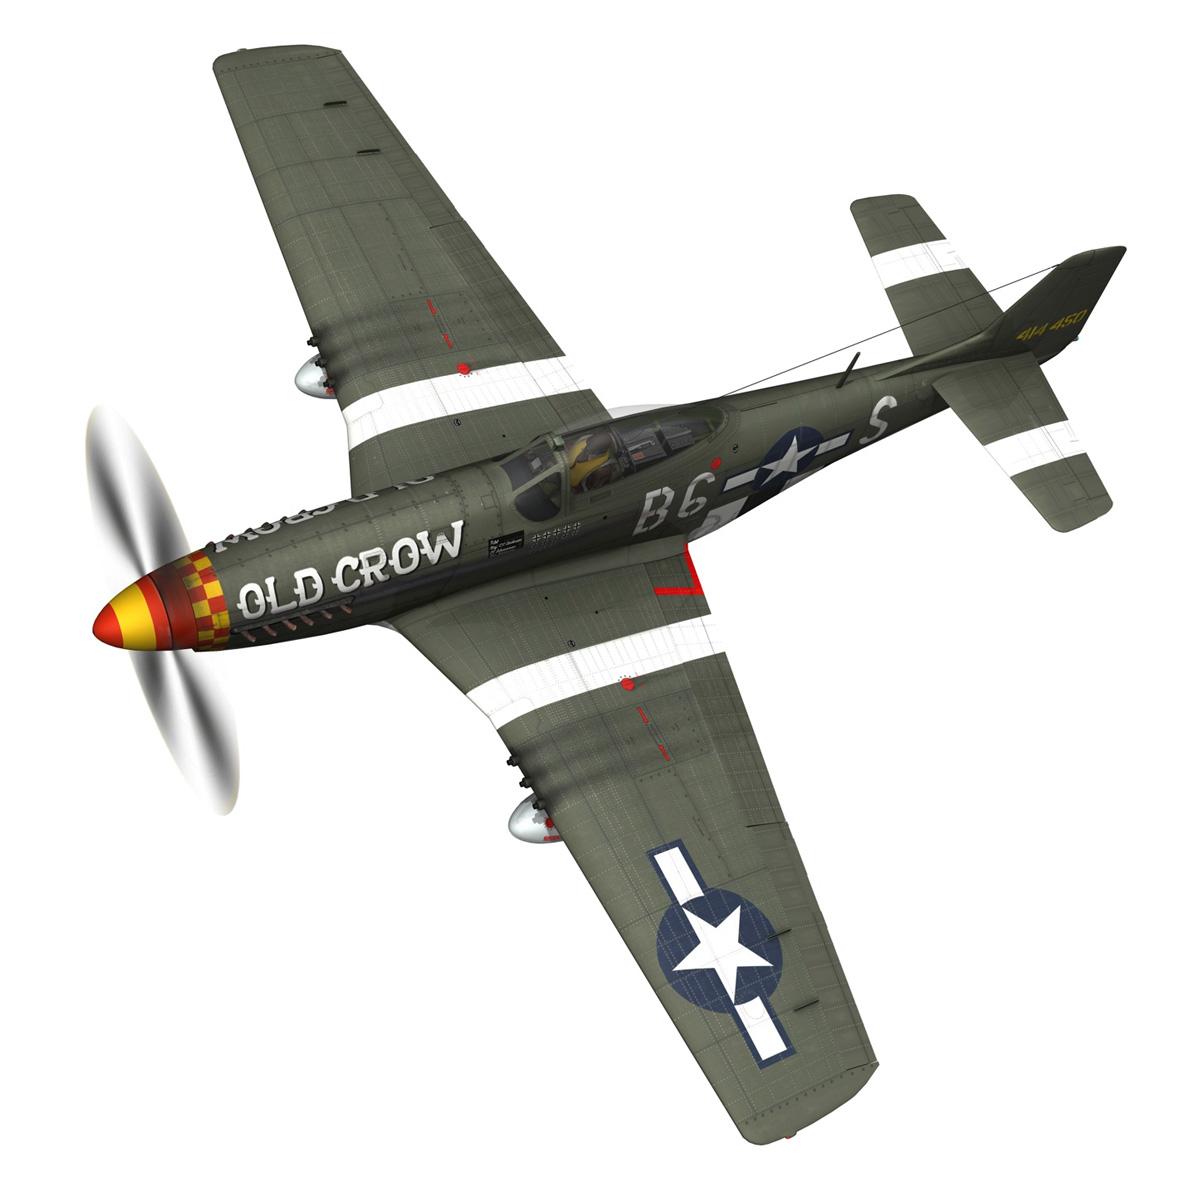 north american p-51d mustang – old crow 3d model fbx c4d lwo obj 273334